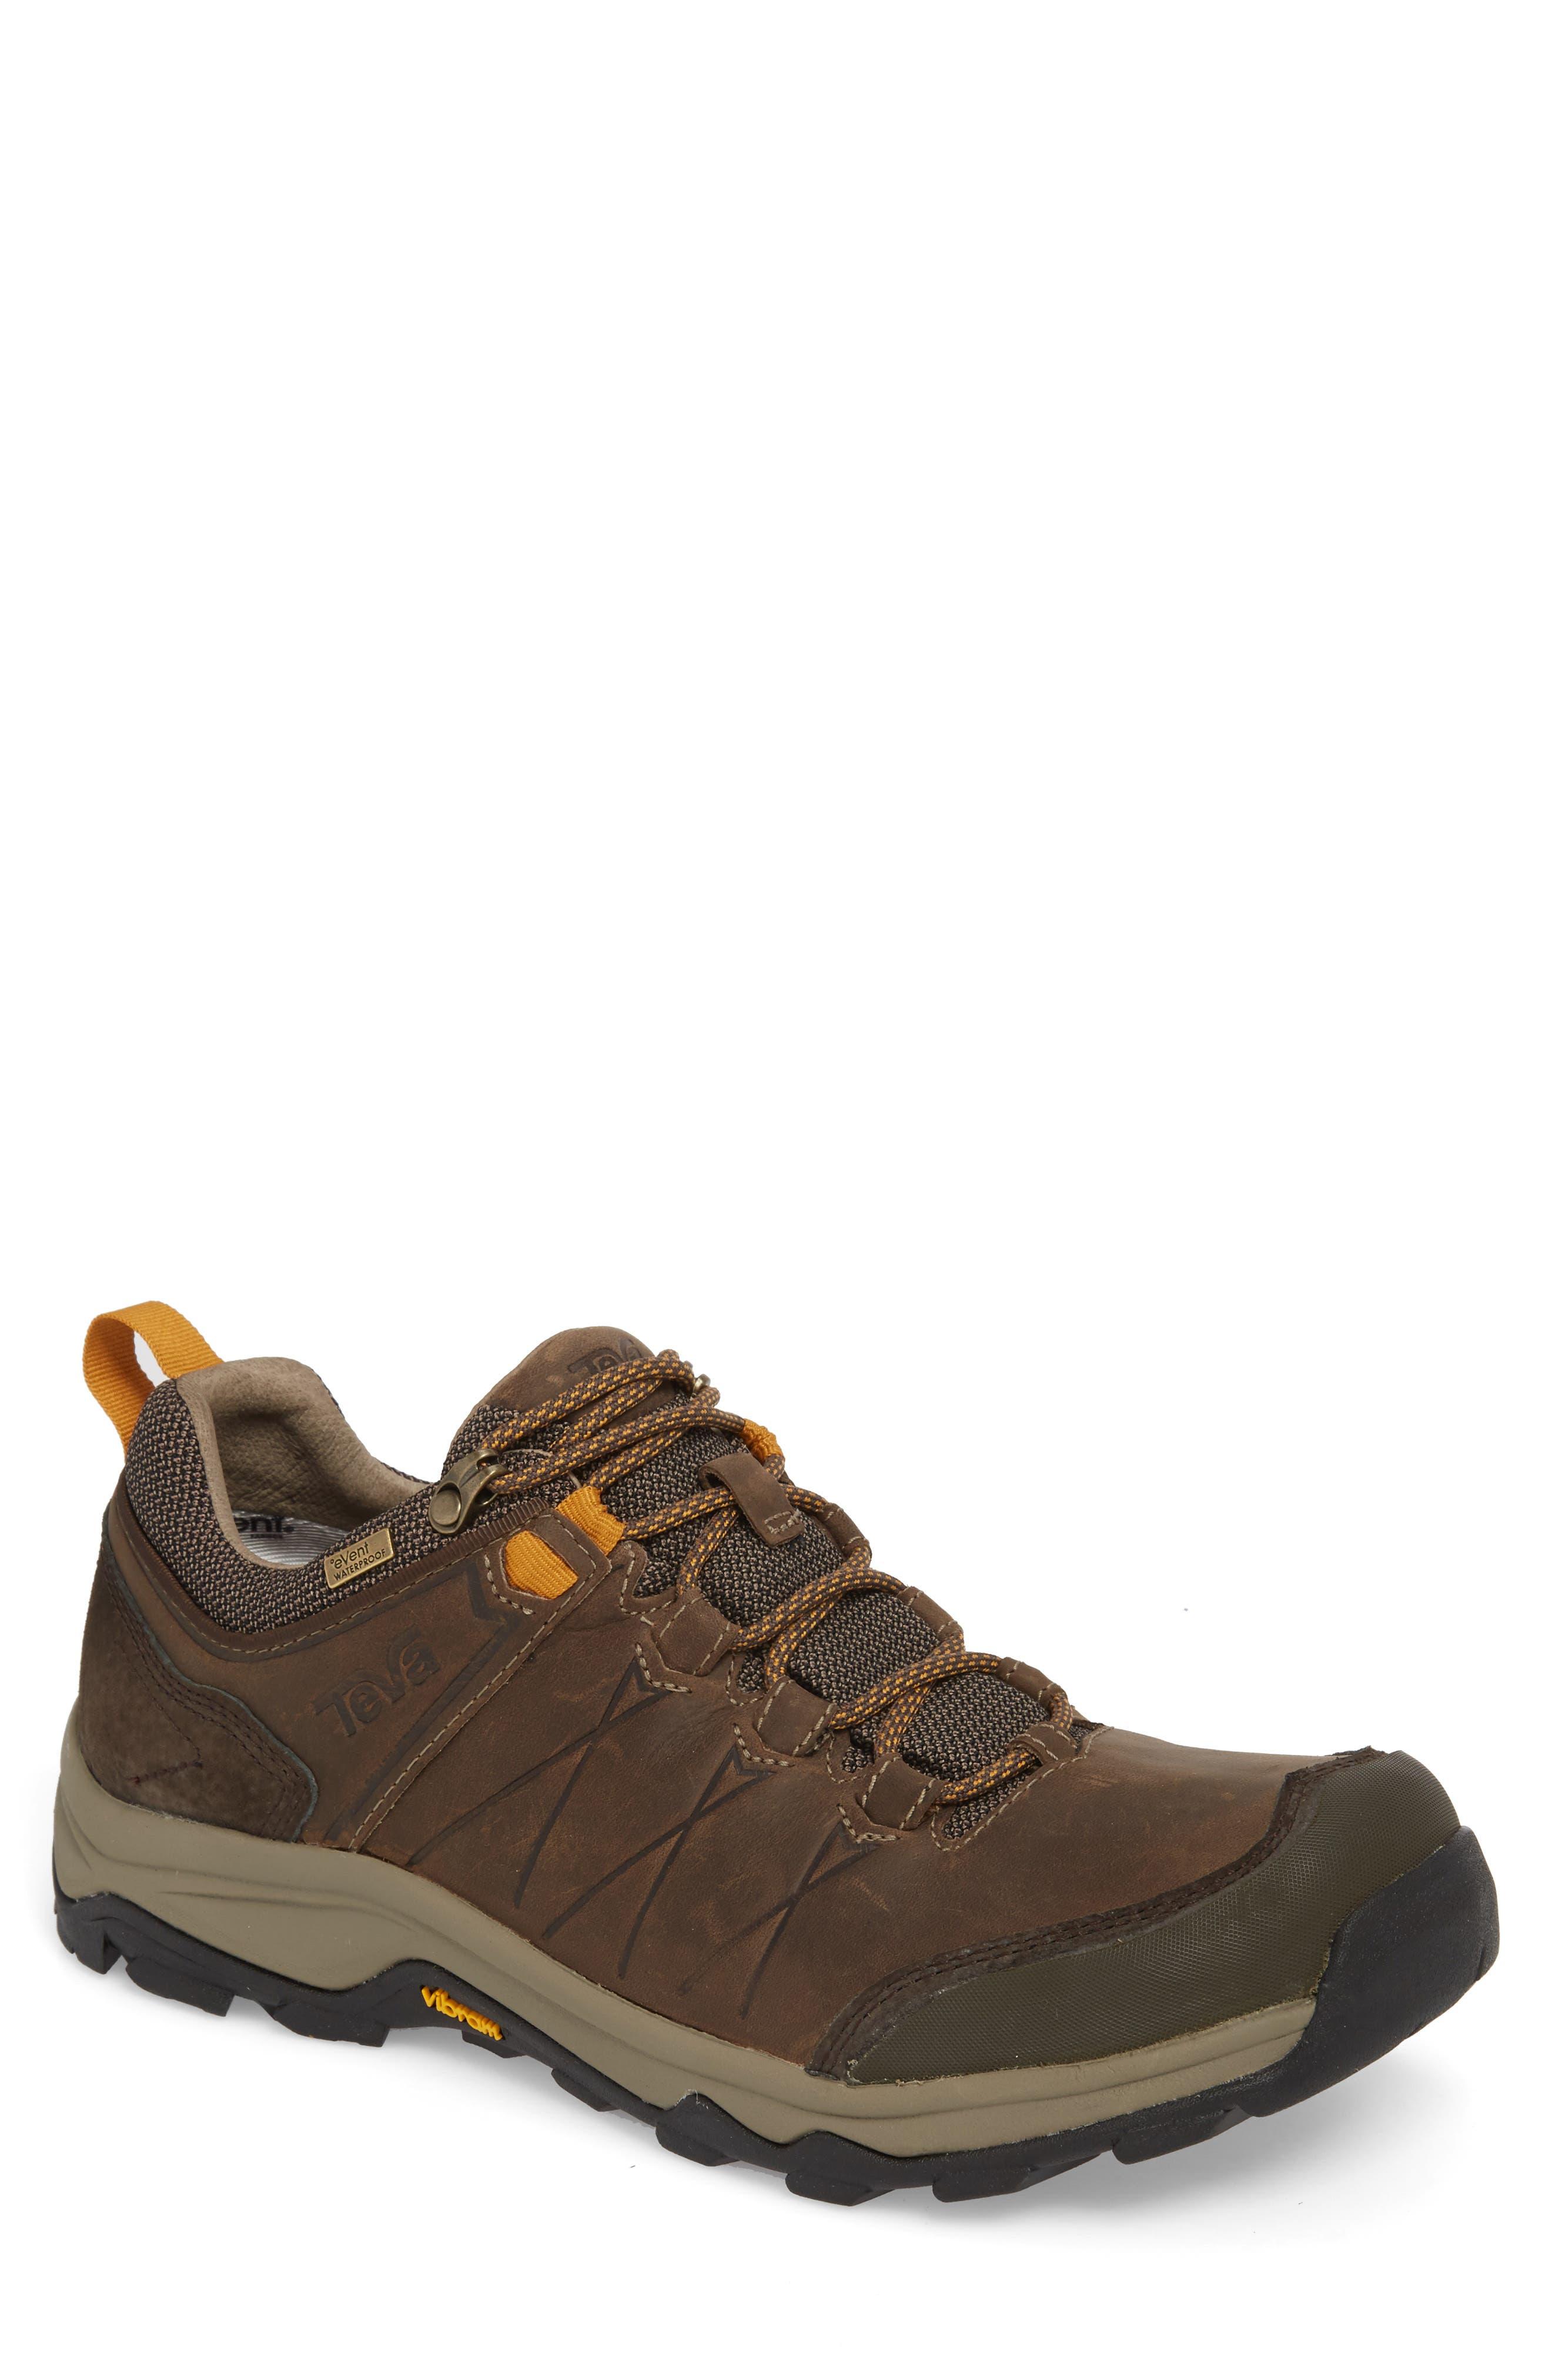 Arrowood Riva Waterproof Sneaker,                             Main thumbnail 1, color,                             WALNUT LEATHER